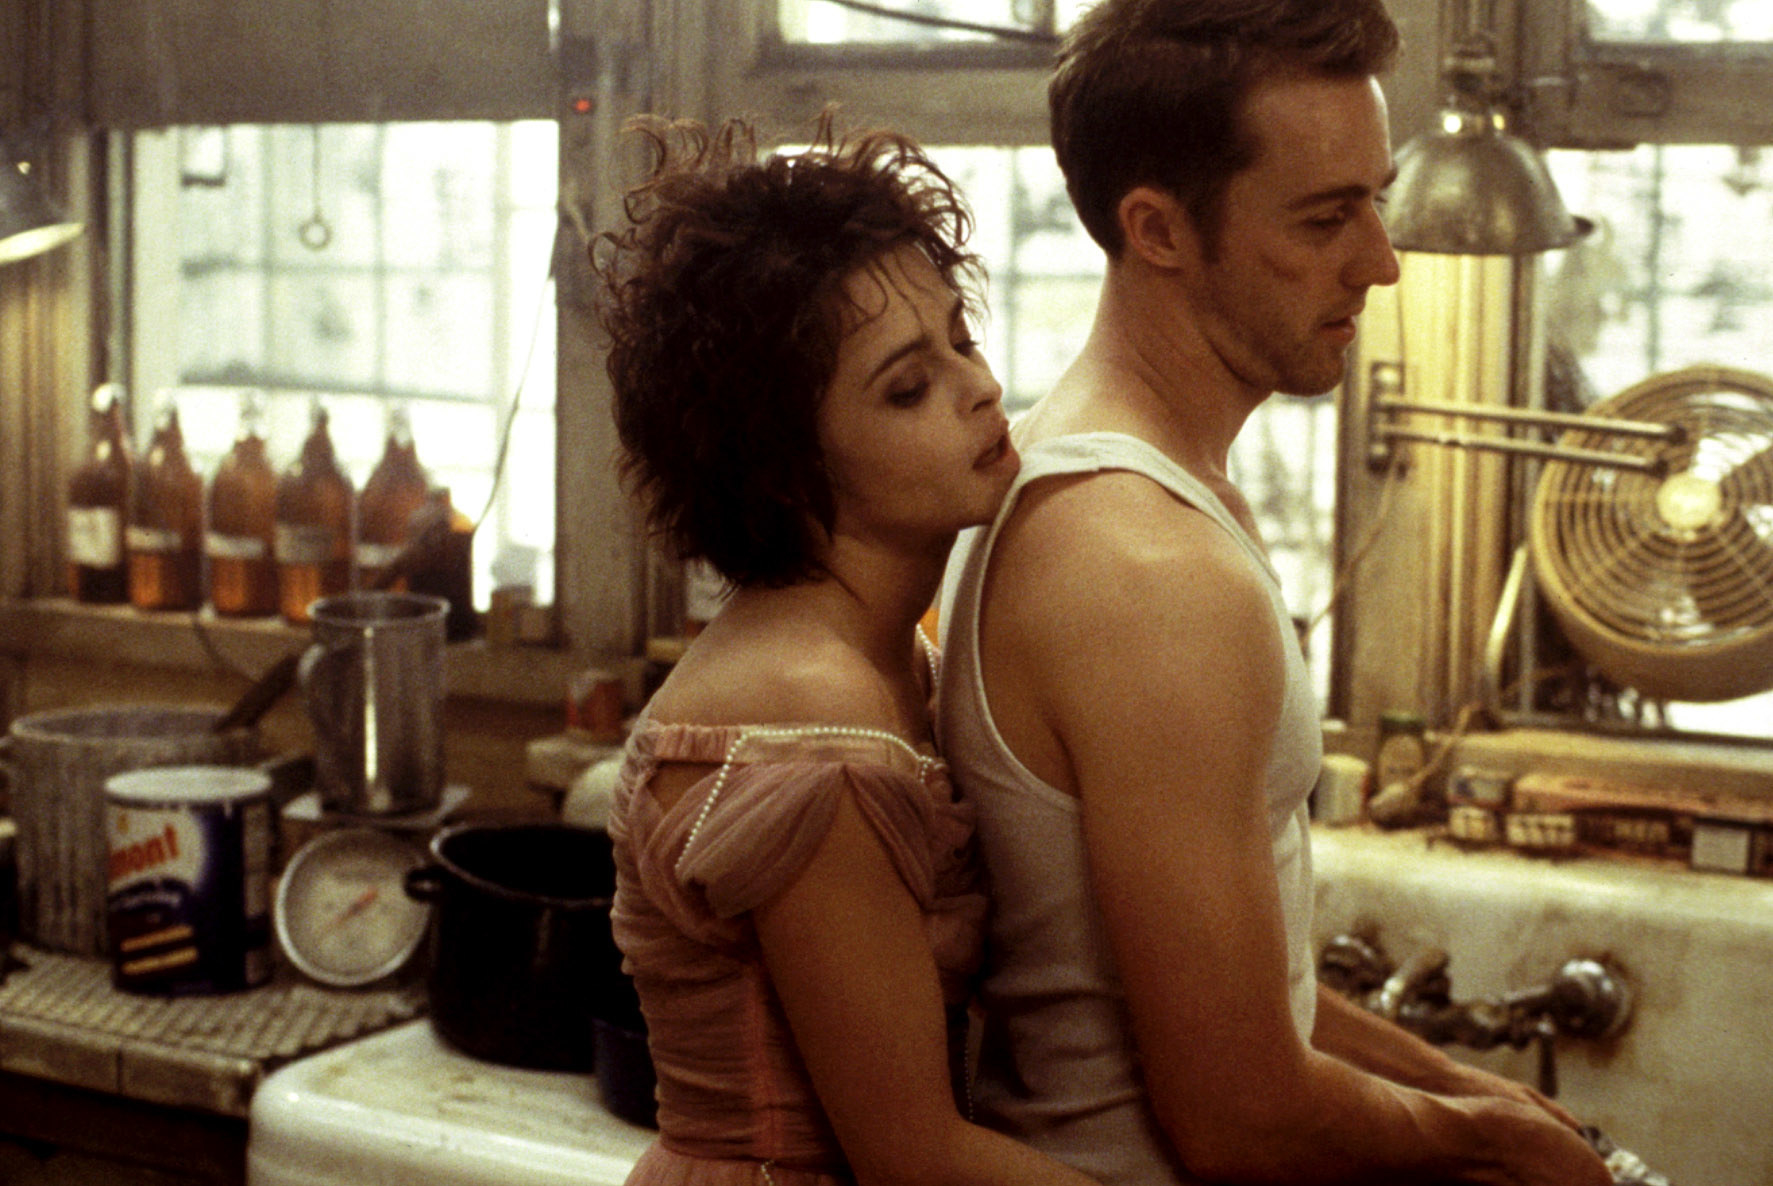 Helena Bonham Carter hugging Edward Norton from behind in a kitchen